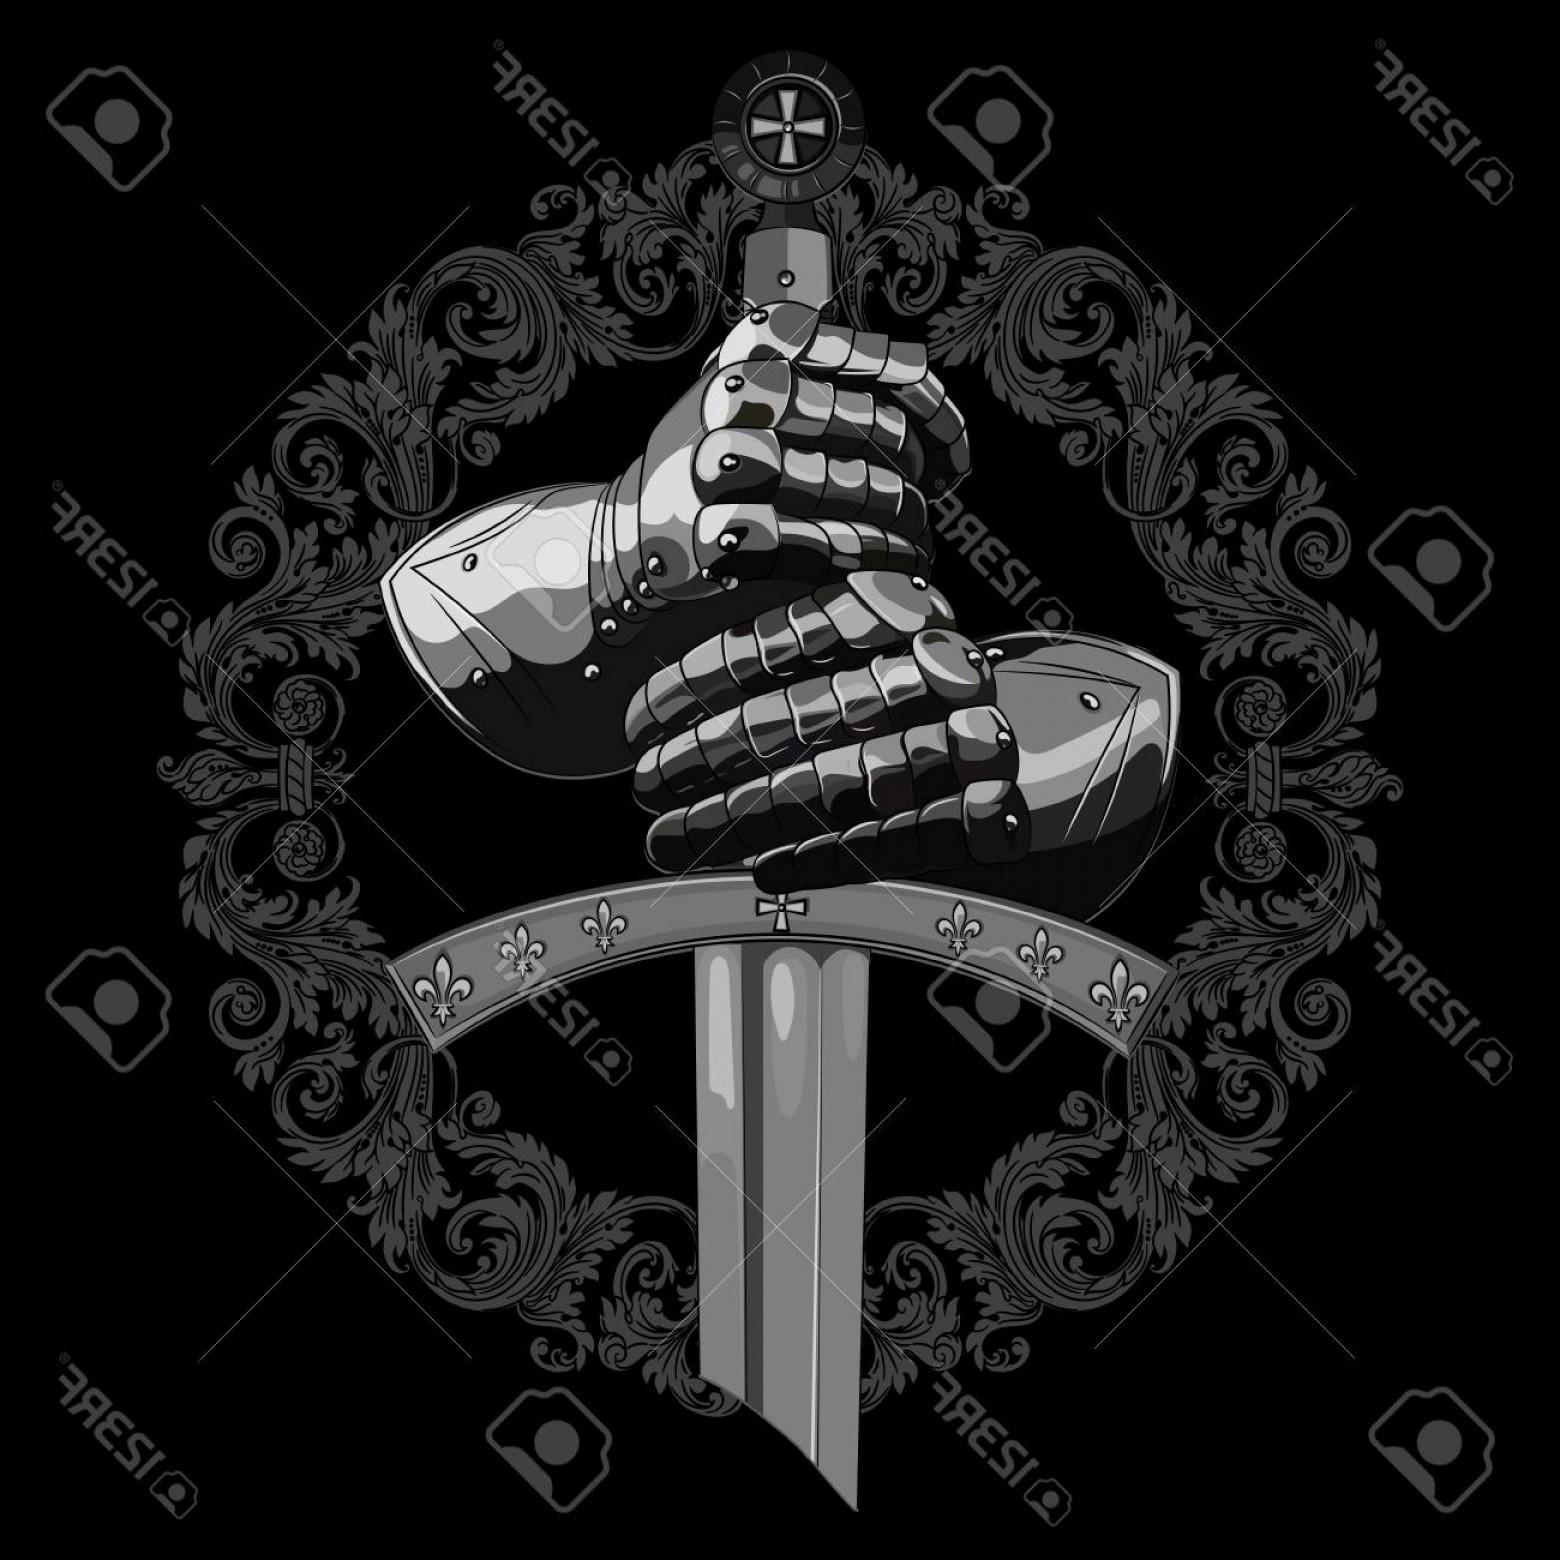 1560x1560 Crusader Vector Black And White Lazttweet